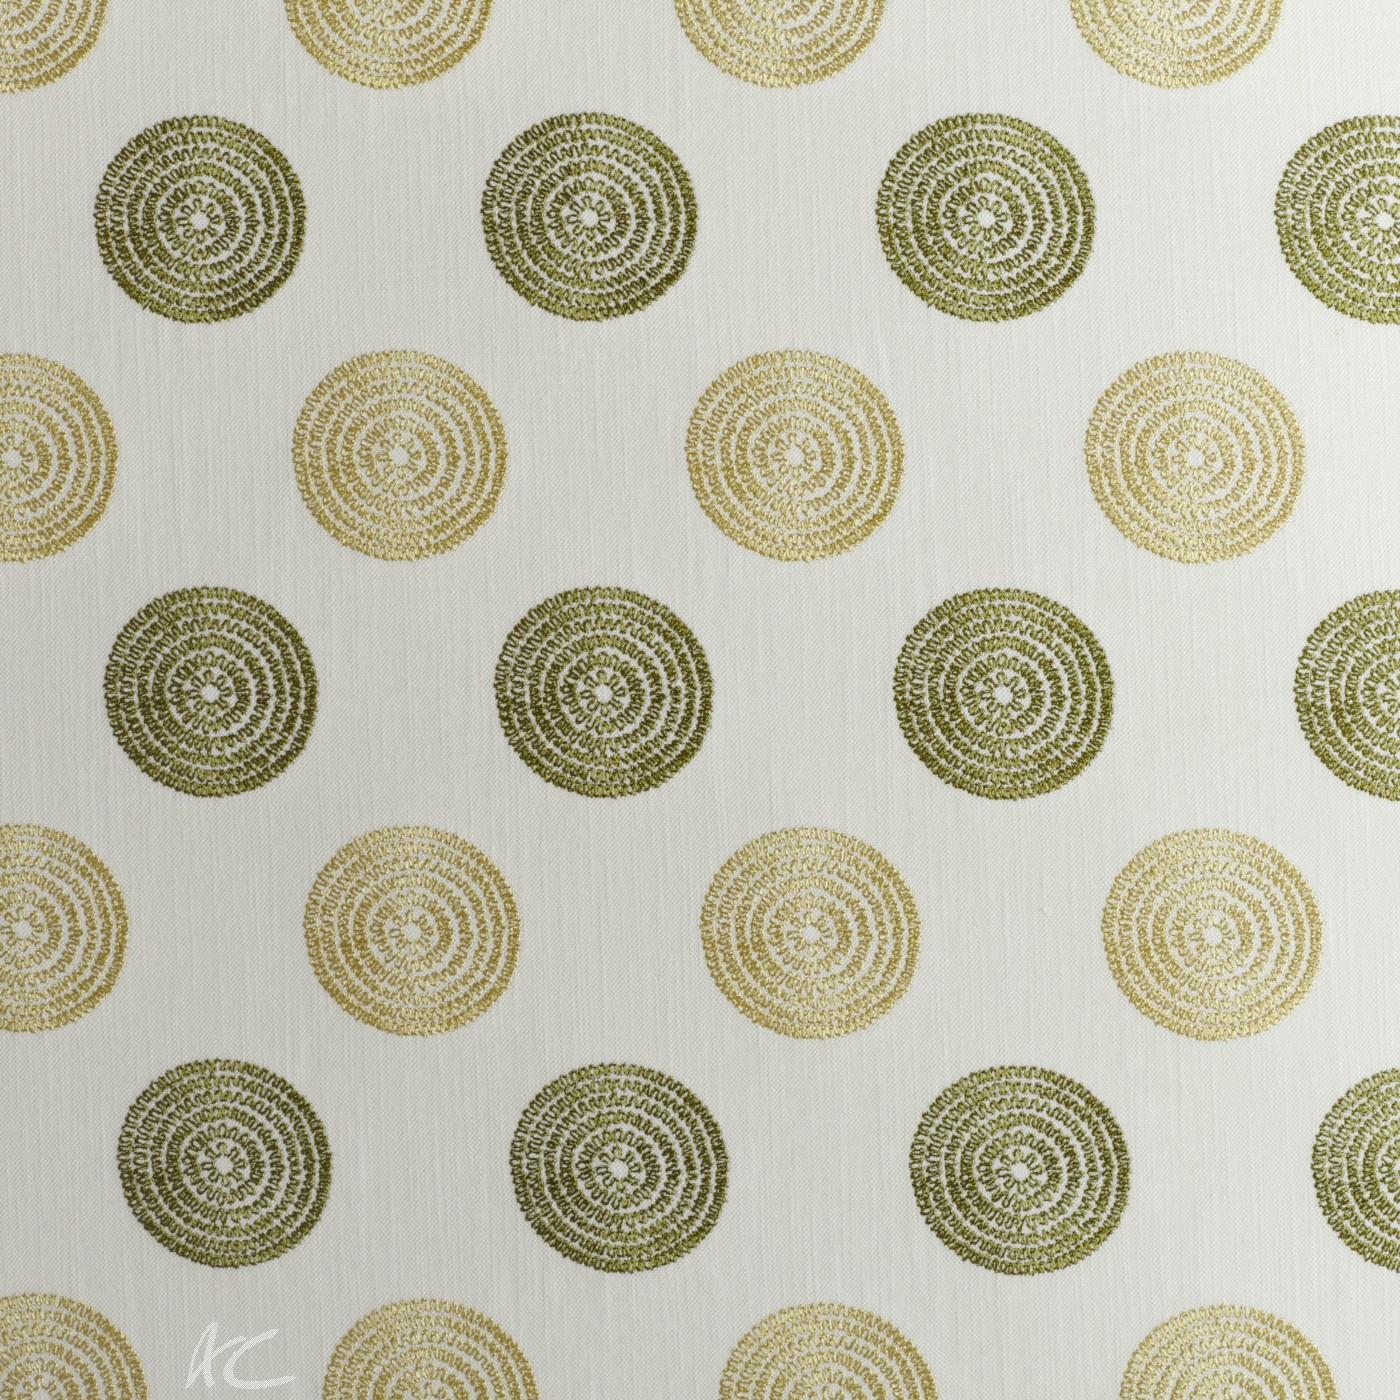 Prestigious Textiles Secret Garden Floret Avocado Cushion Covers